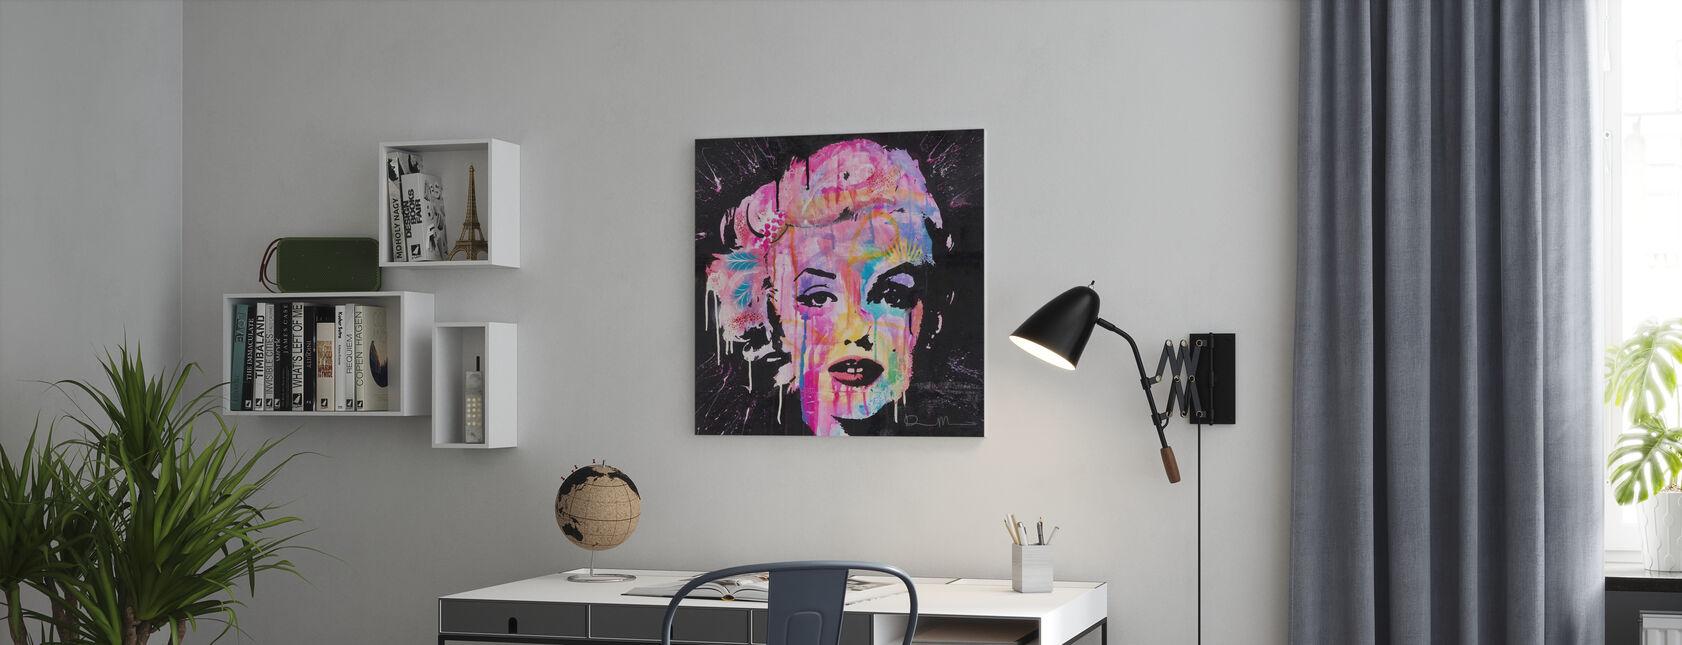 Marilyn - Stampa su tela - Uffici